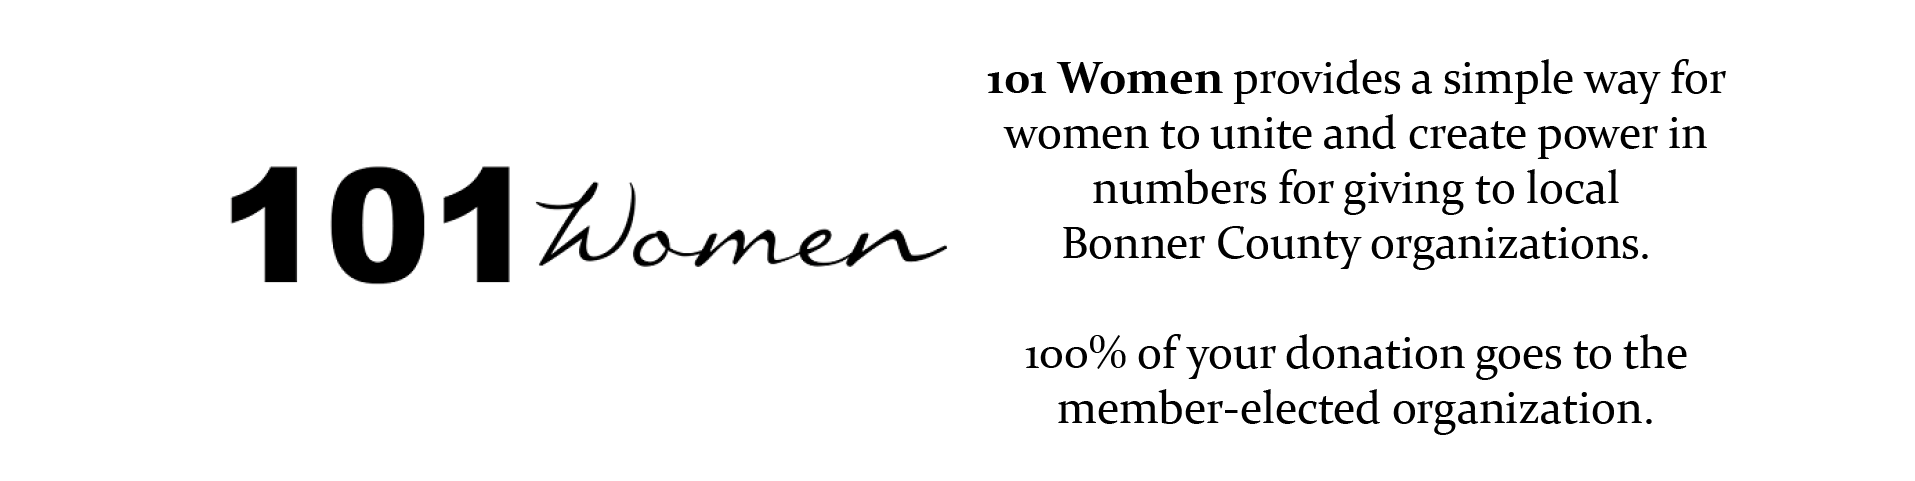 101 Women Inc